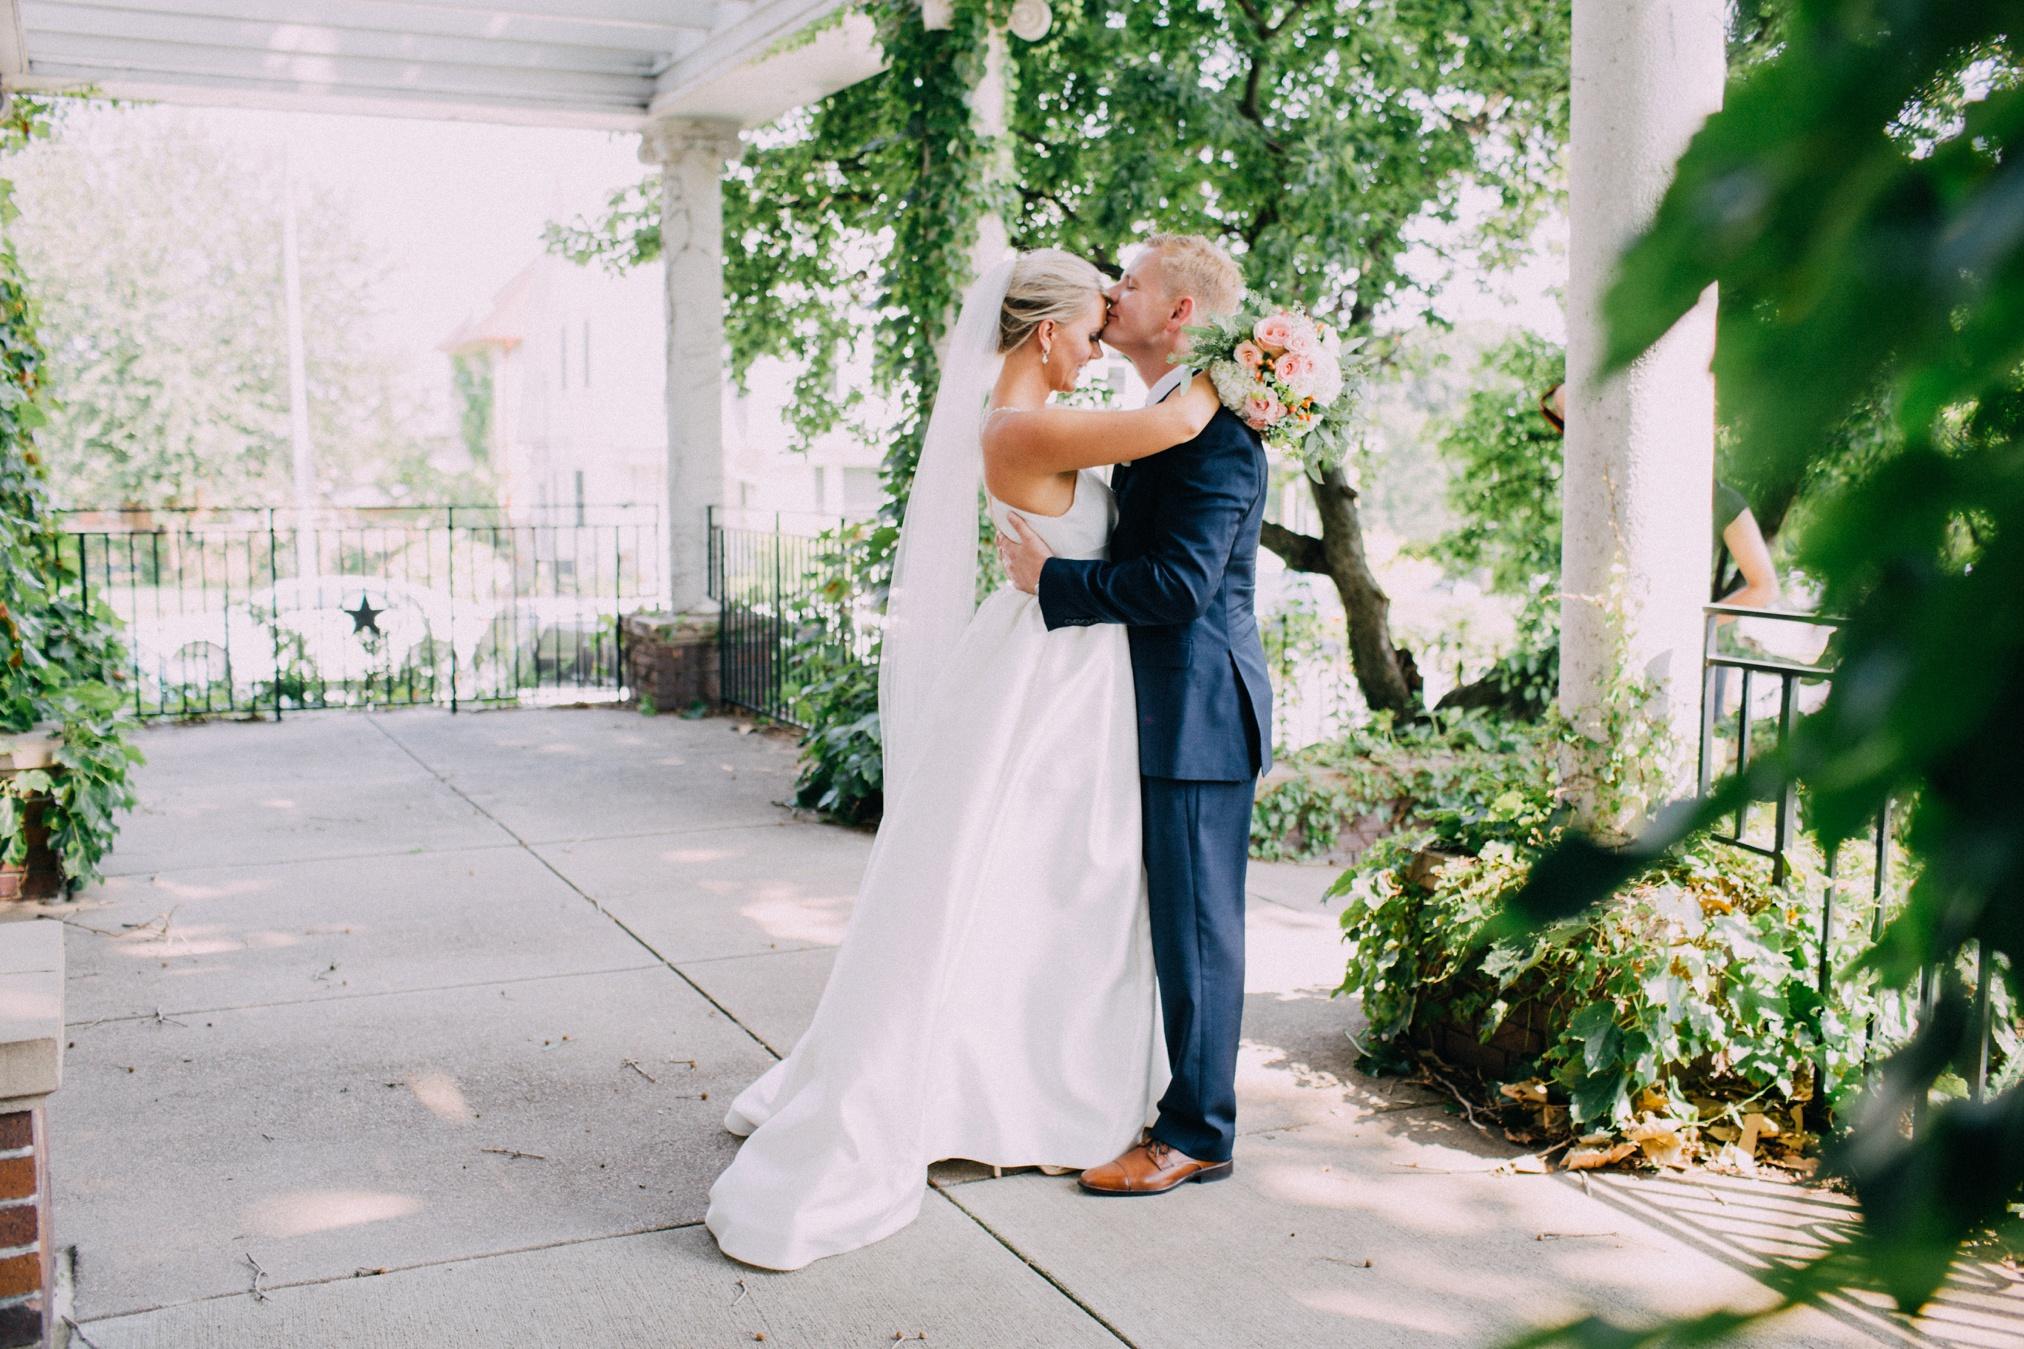 brenna+michael_wedding-278.jpg